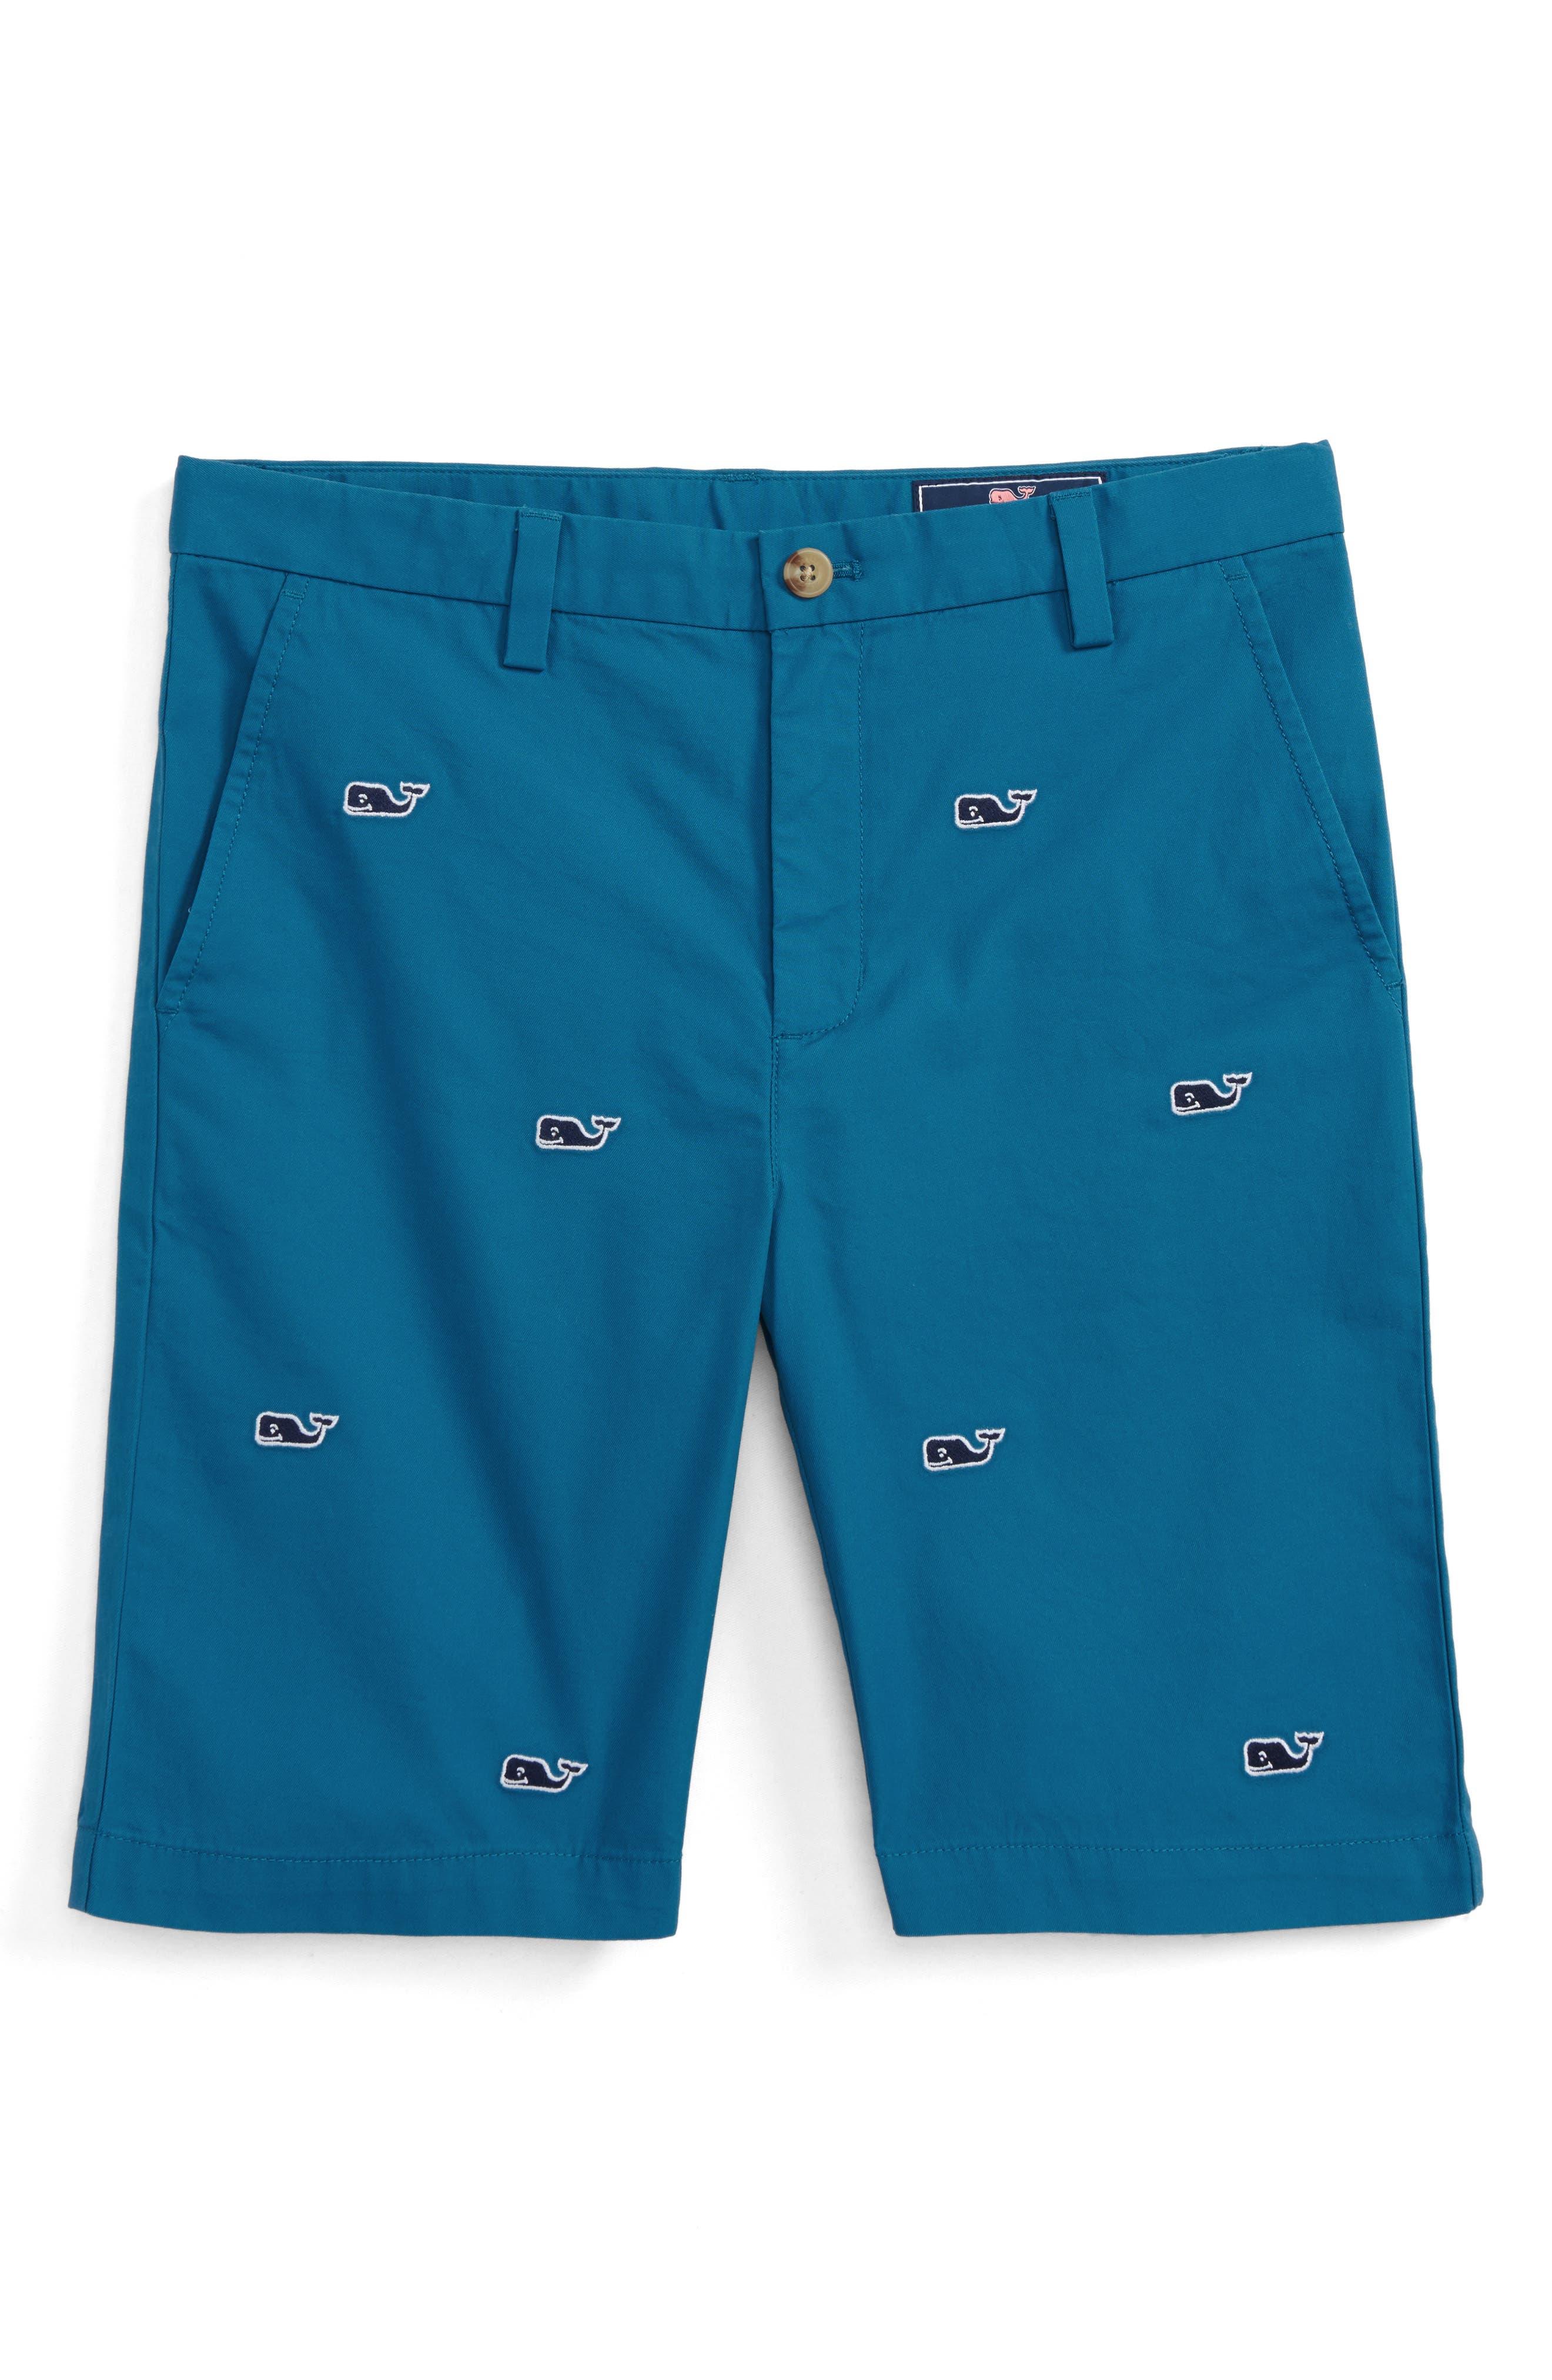 Breaker Whale Embroidered Shorts,                         Main,                         color, Schooner Blue